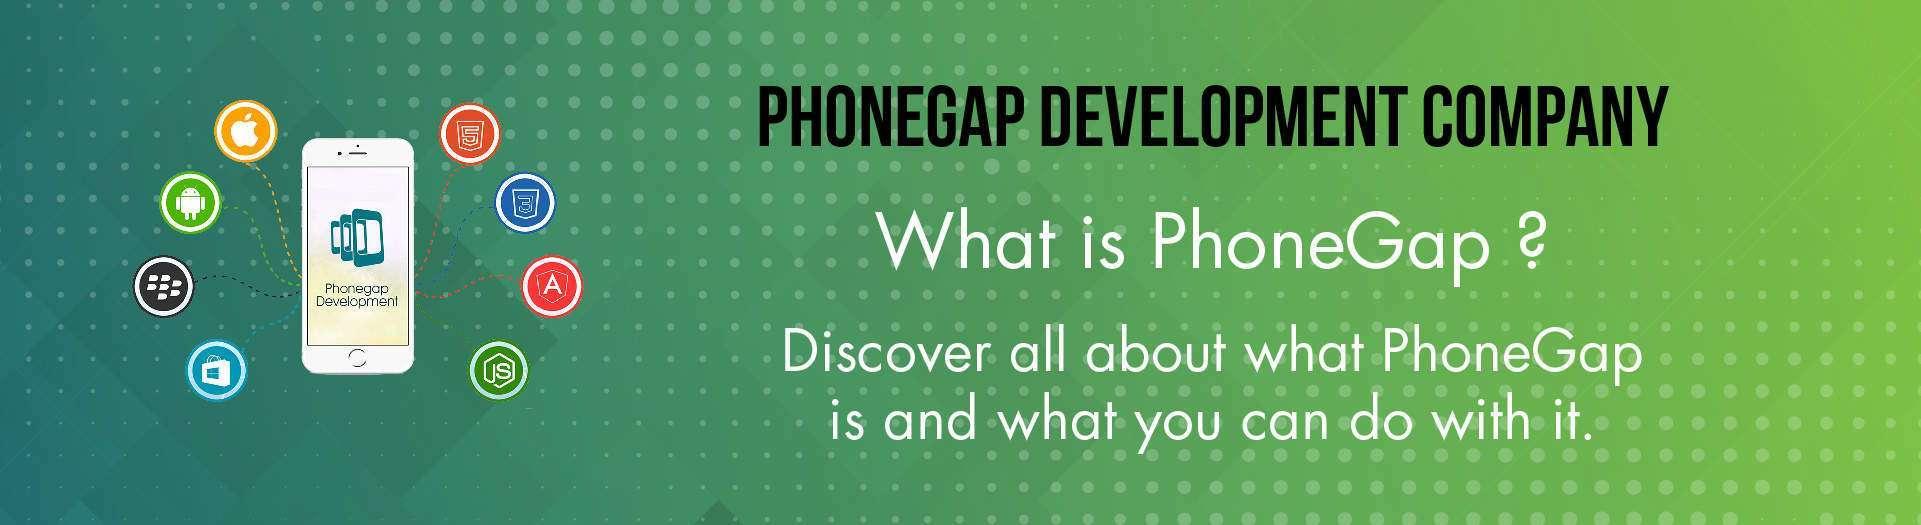 2Pm Bst To Aest phonegap app developer, phonegap app development company india